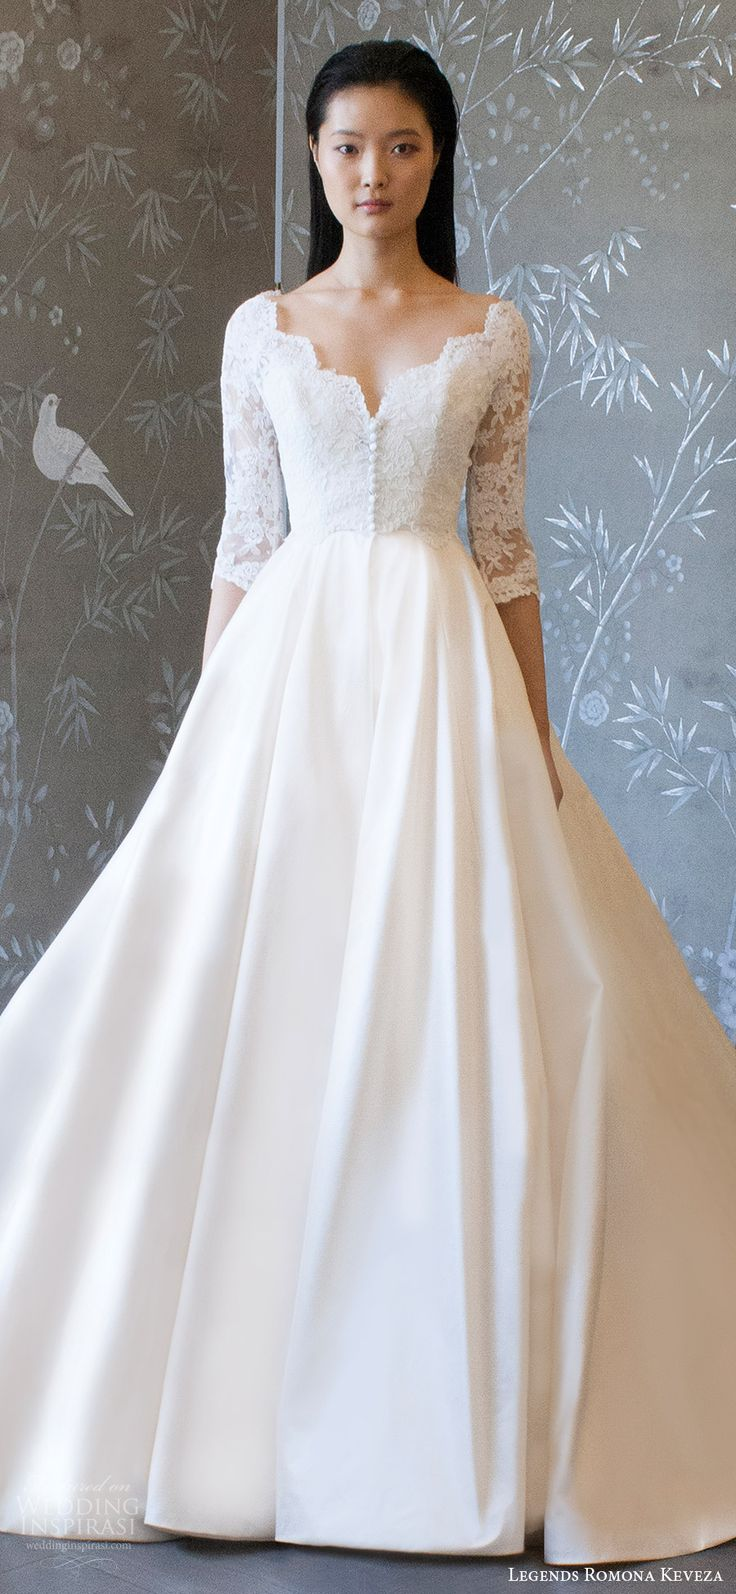 legends romona keveza spring 2018 bridal 3 quarter sleeves v neck lace bodice a line ball gown wedding dress (l8132) zv train romantic elegant -- Legends Romona Keveza Spring 2018 Wedding Dresses